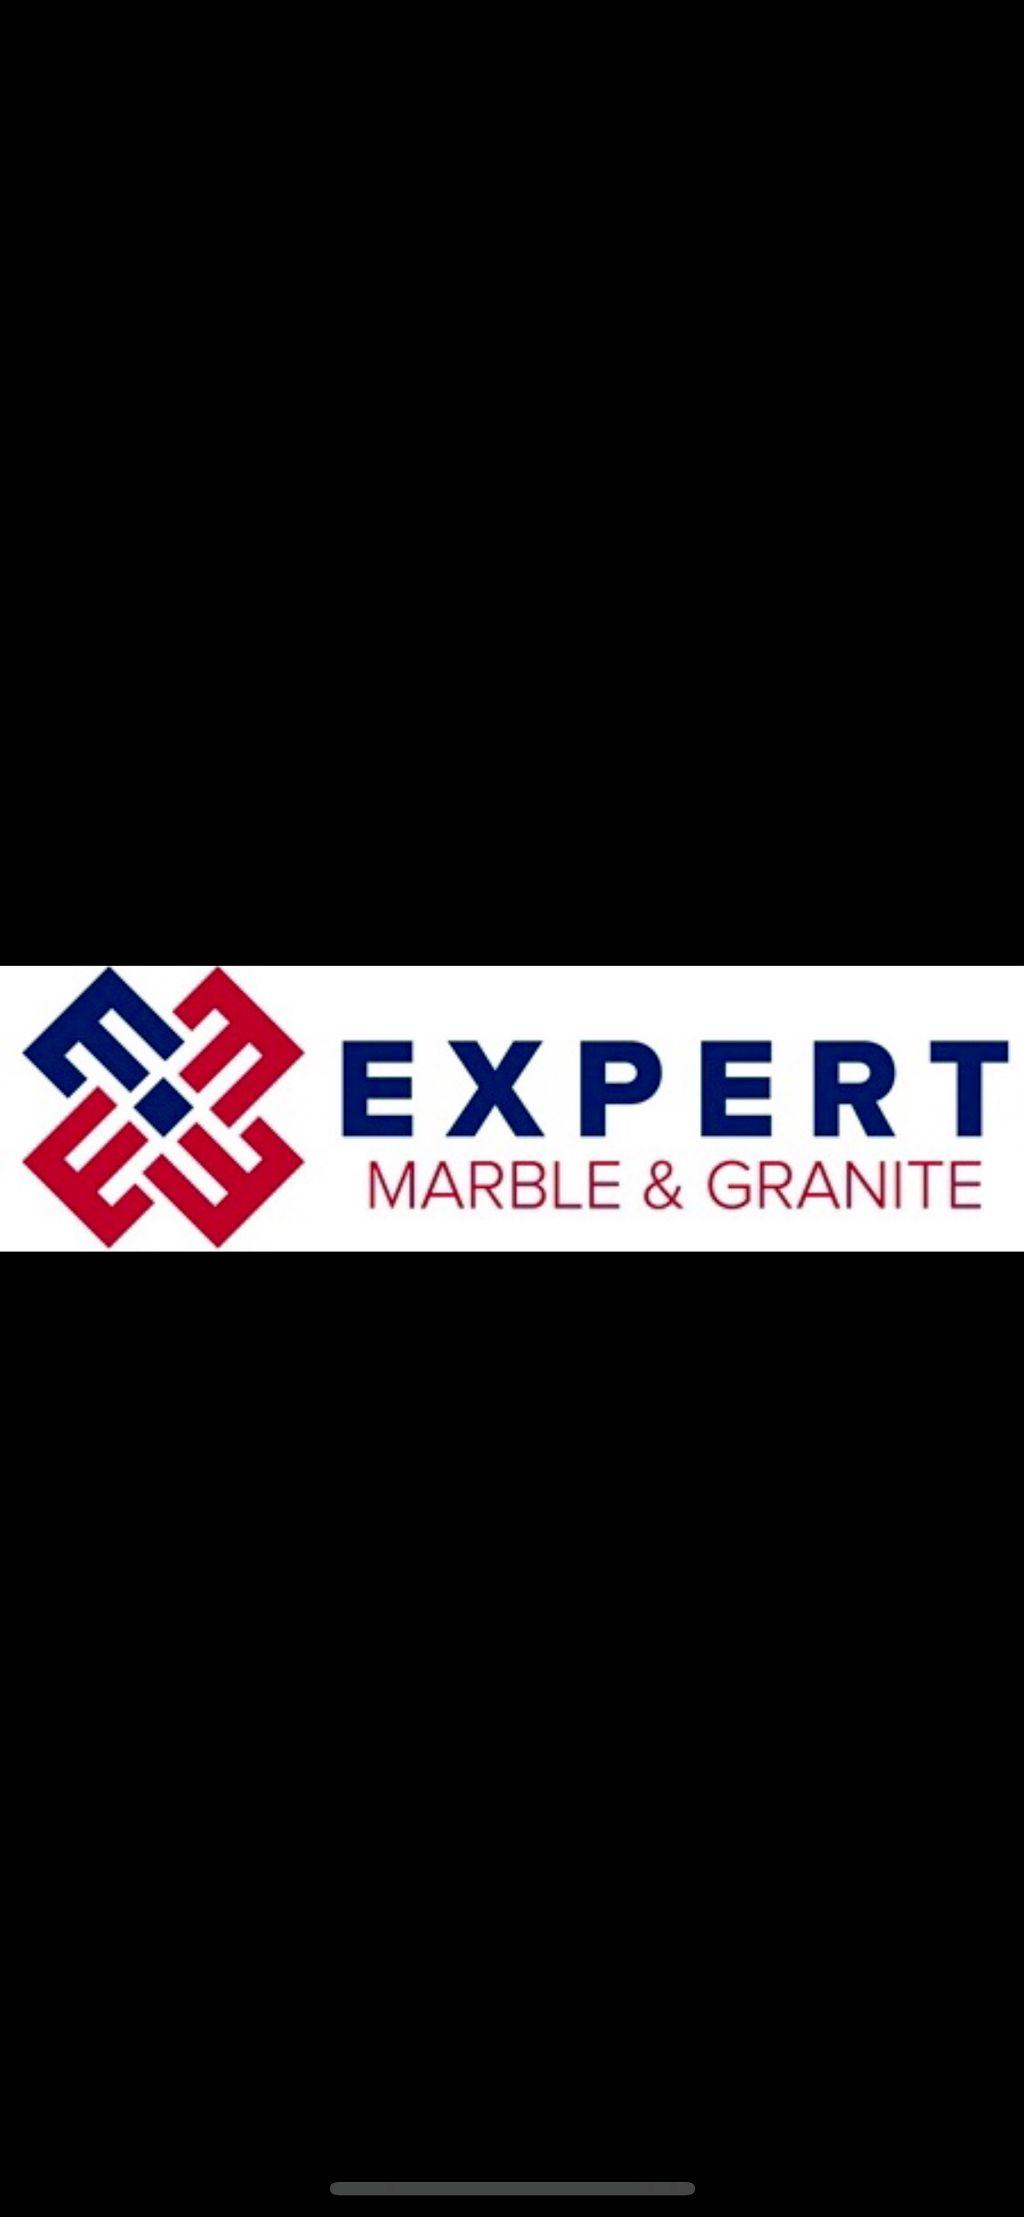 EXPERT MARBLE AND GRANITE